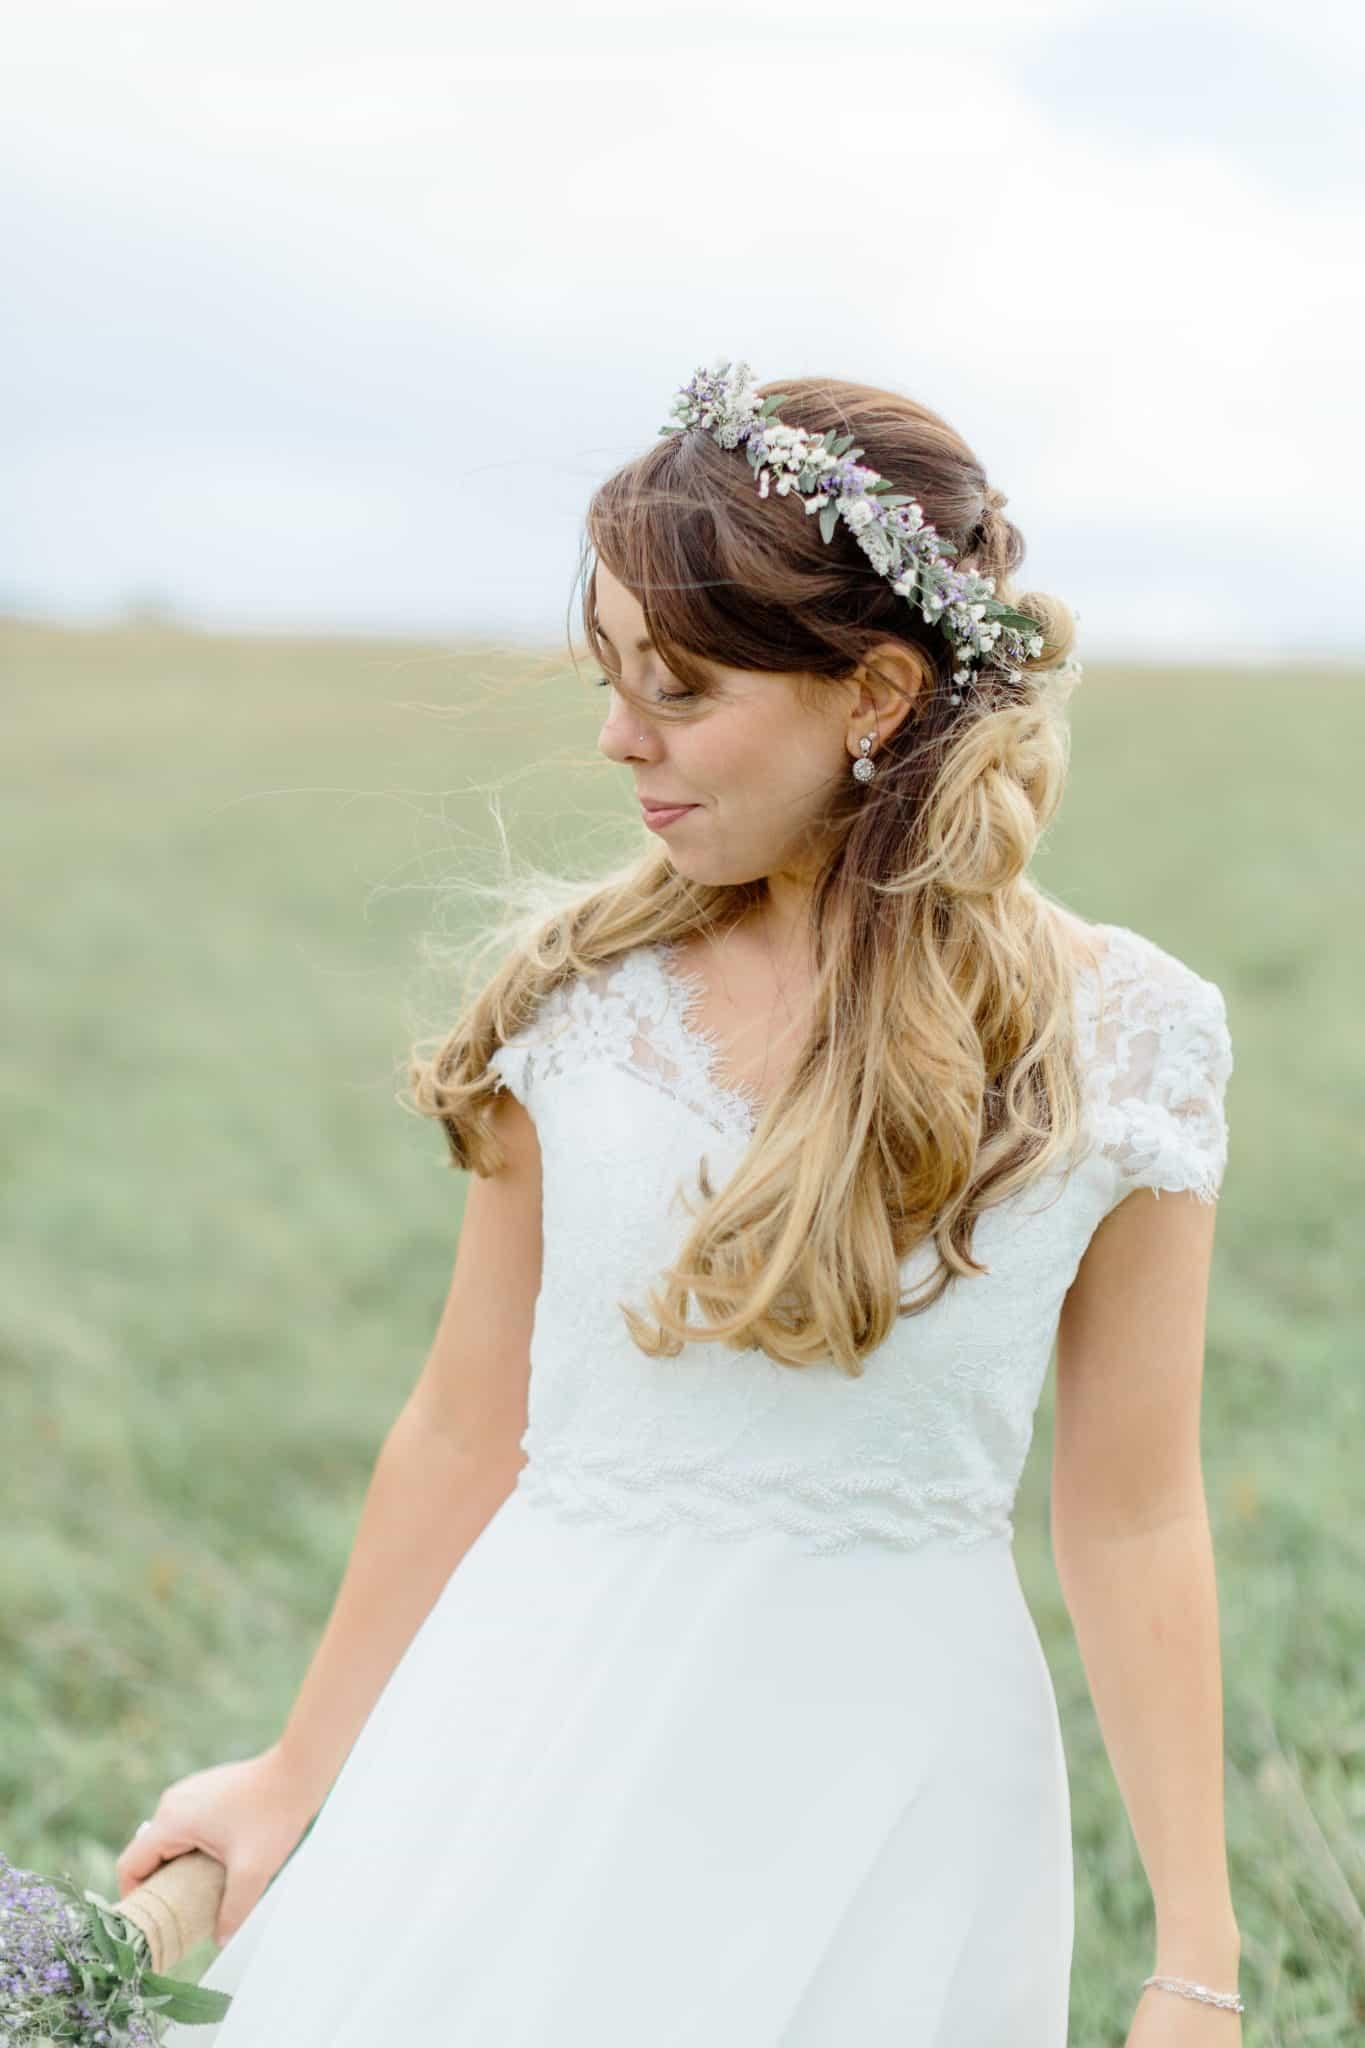 boho bride with flower crown in field